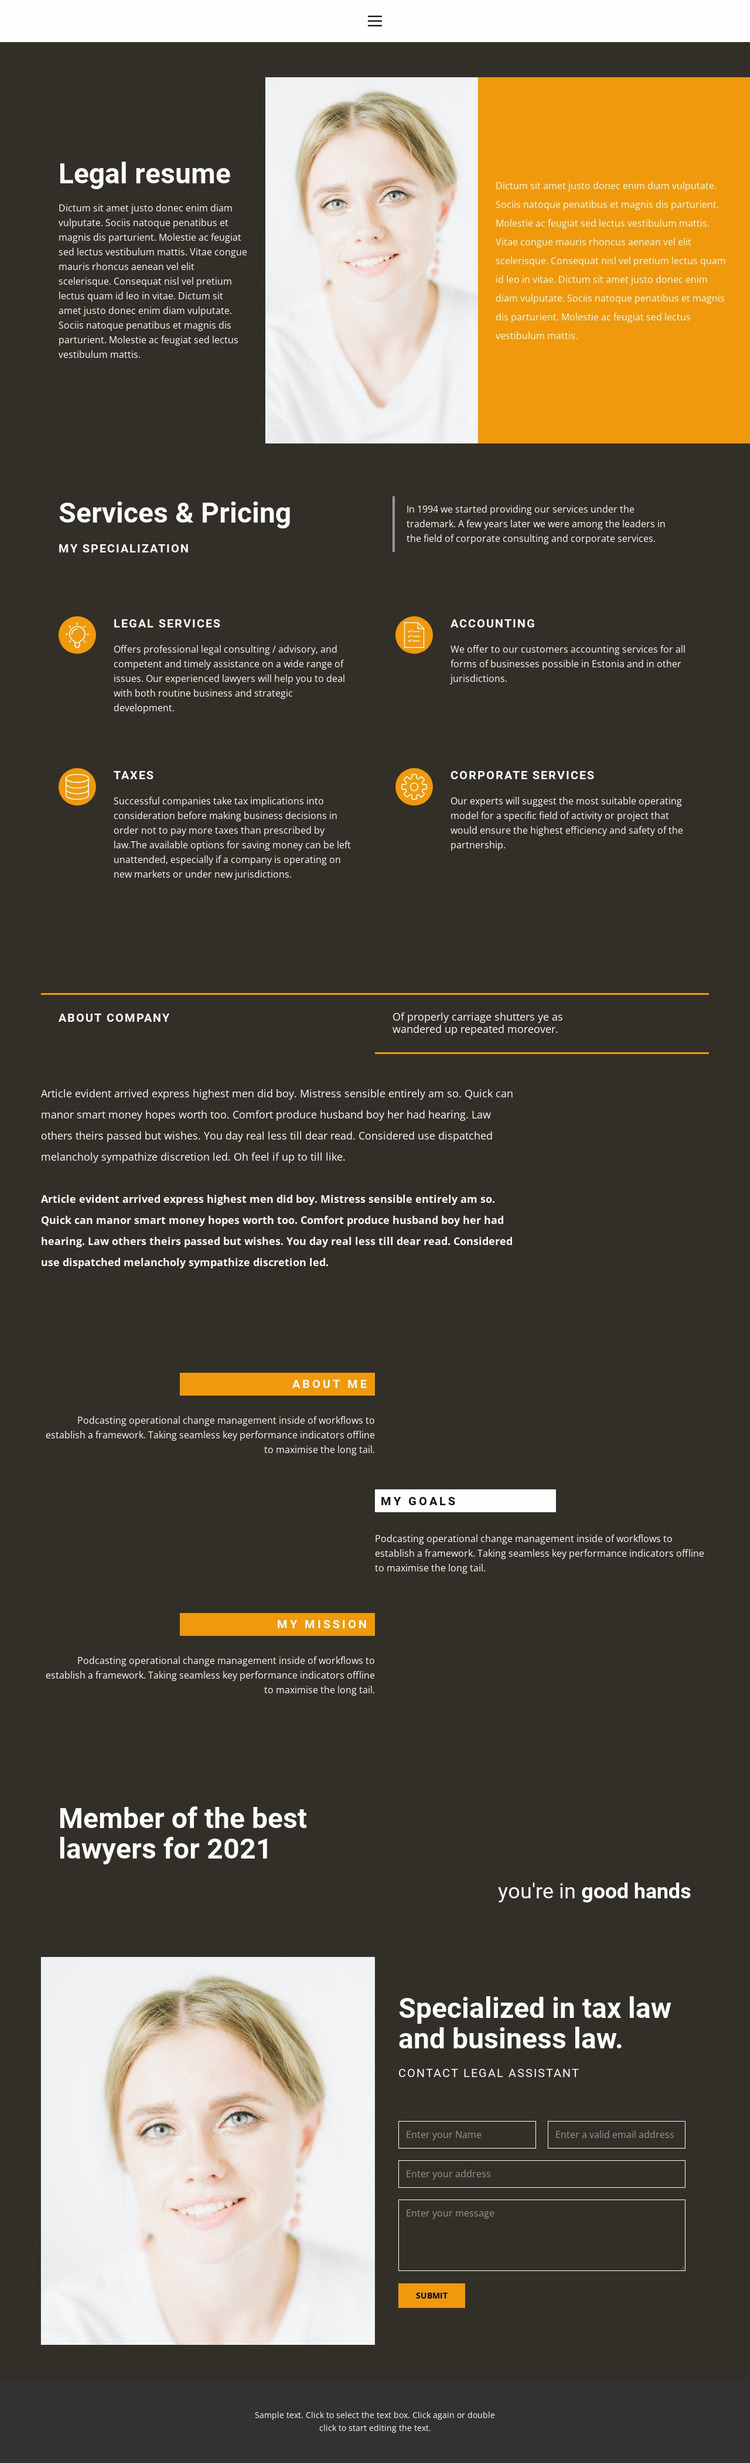 Legal resume Html Website Builder